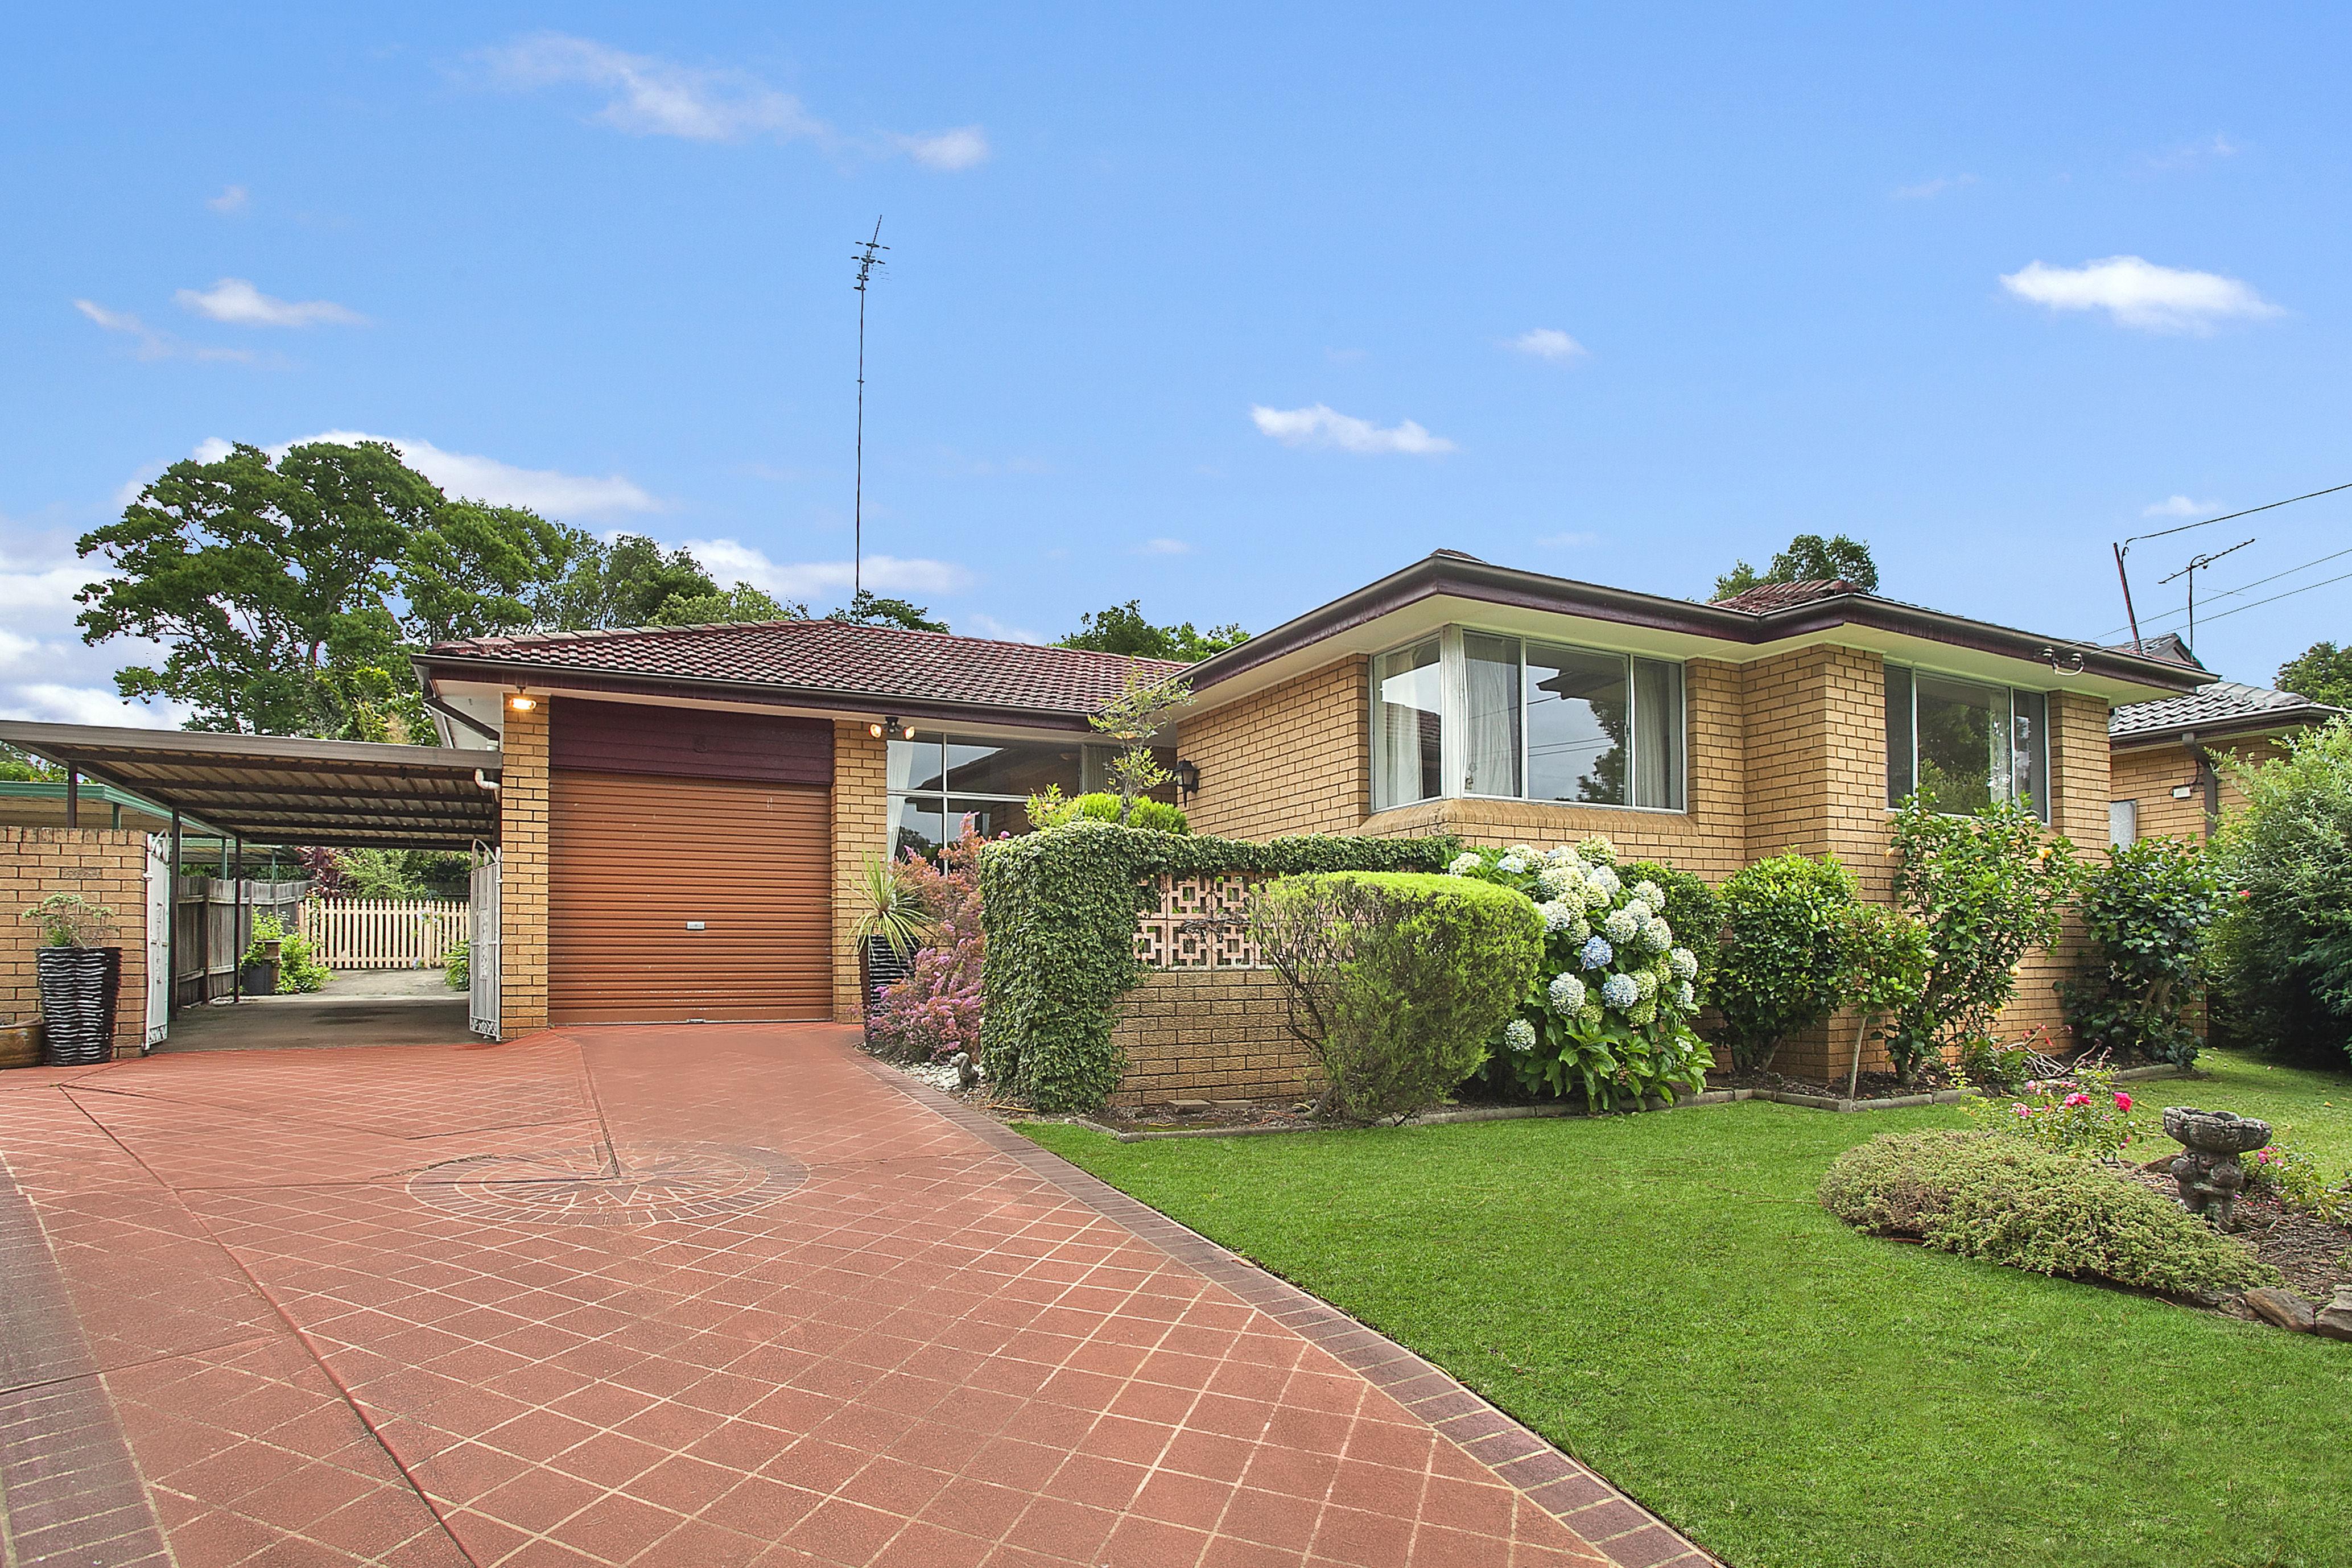 5 Rooms, House, Sold , Talisman Avenue, 2 Bathrooms, Listing ID 1039, CASTLE HILL, Australia,